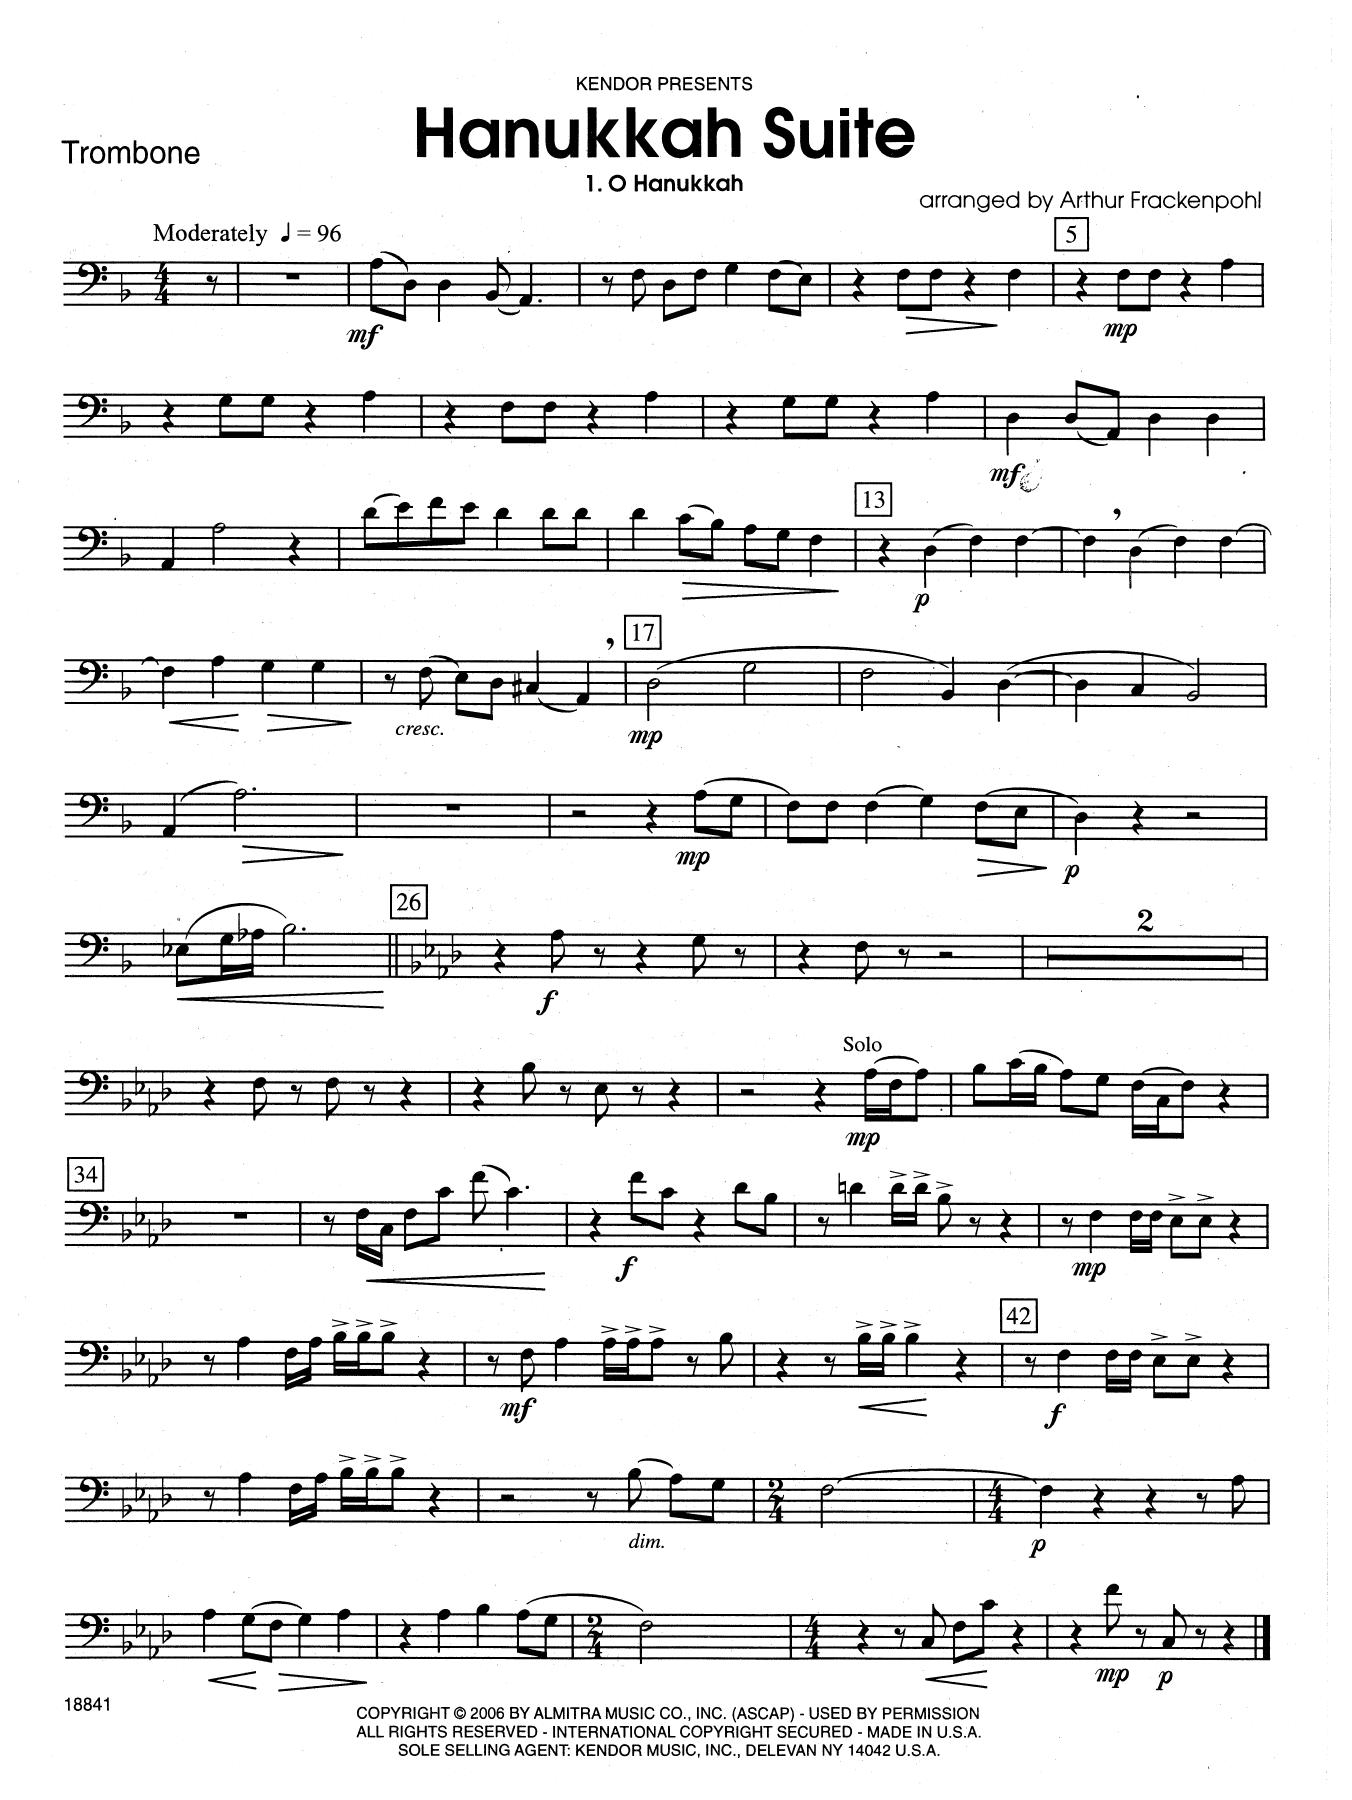 Hanukkah Suite - Trombone Sheet Music